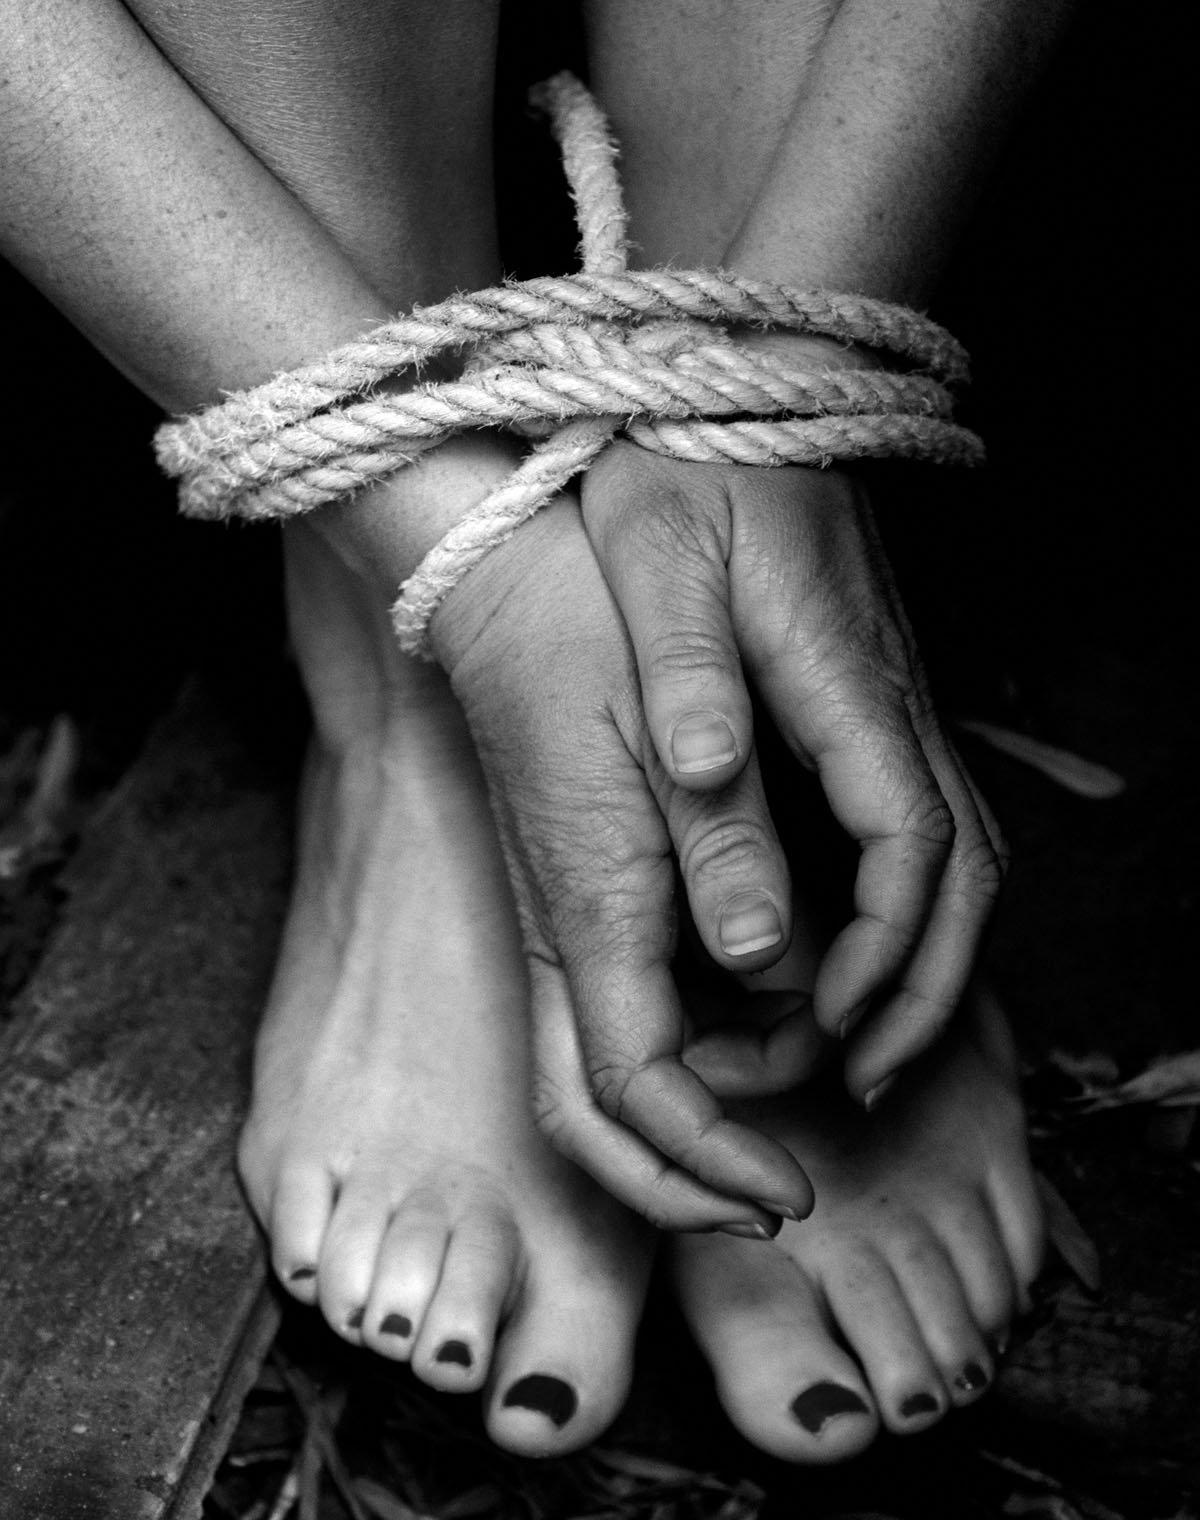 Bdsm vintage ebony rope 6